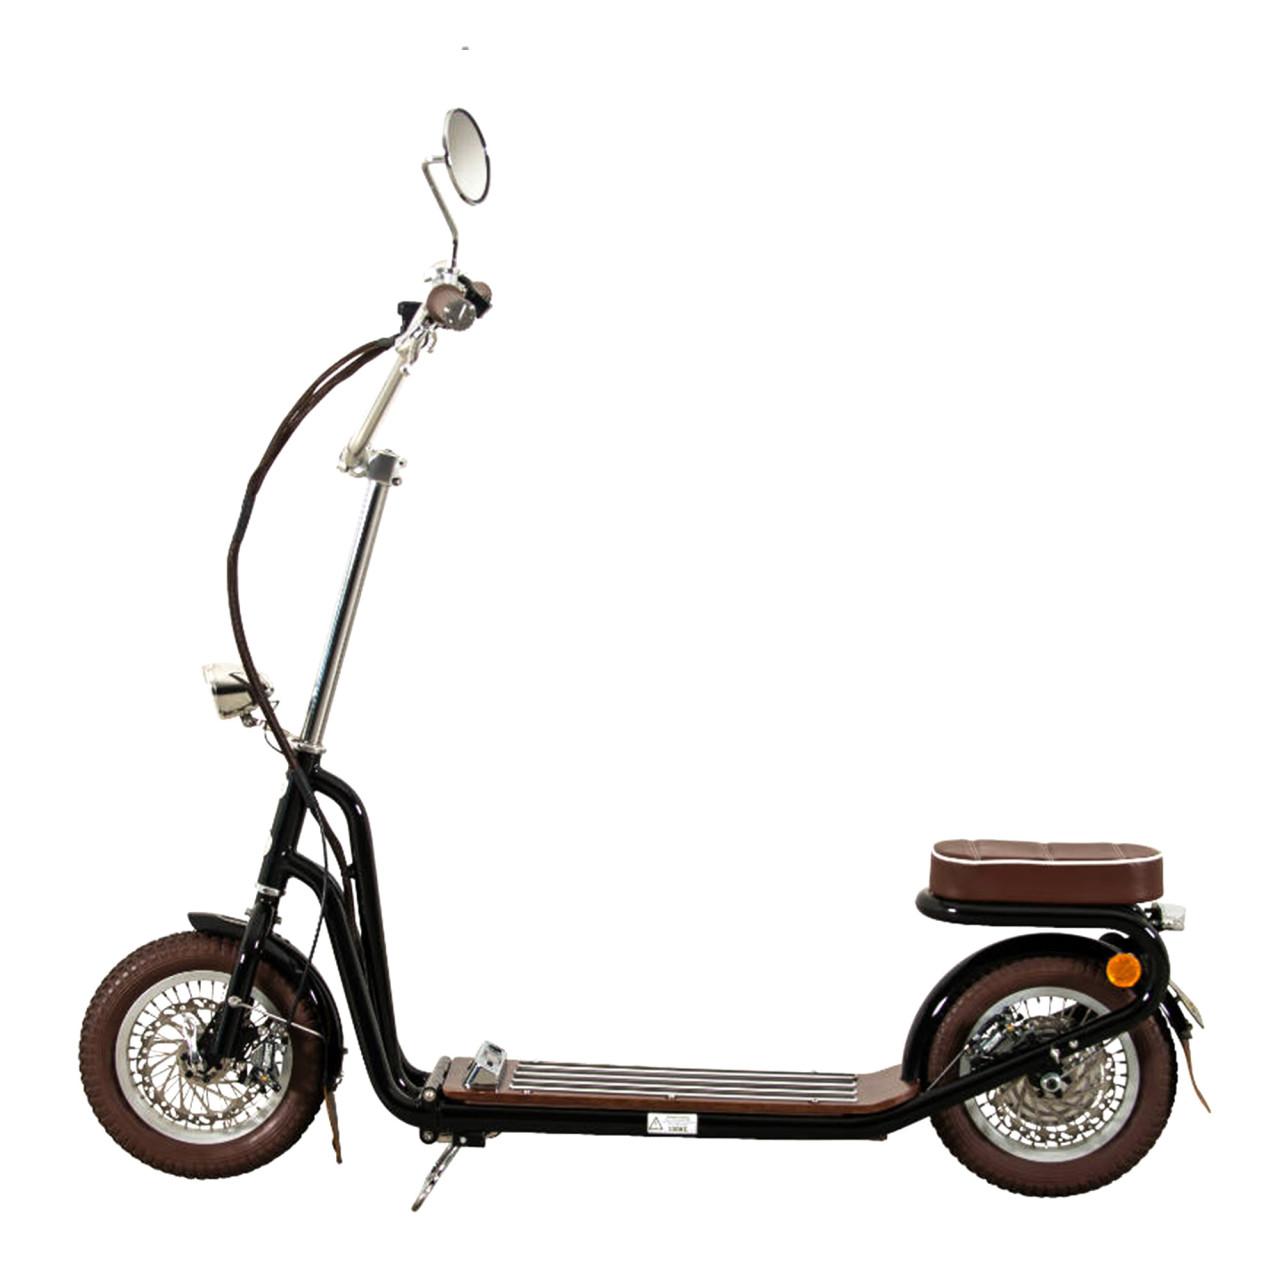 E-Scooter Kumpan 1950 Schwarz